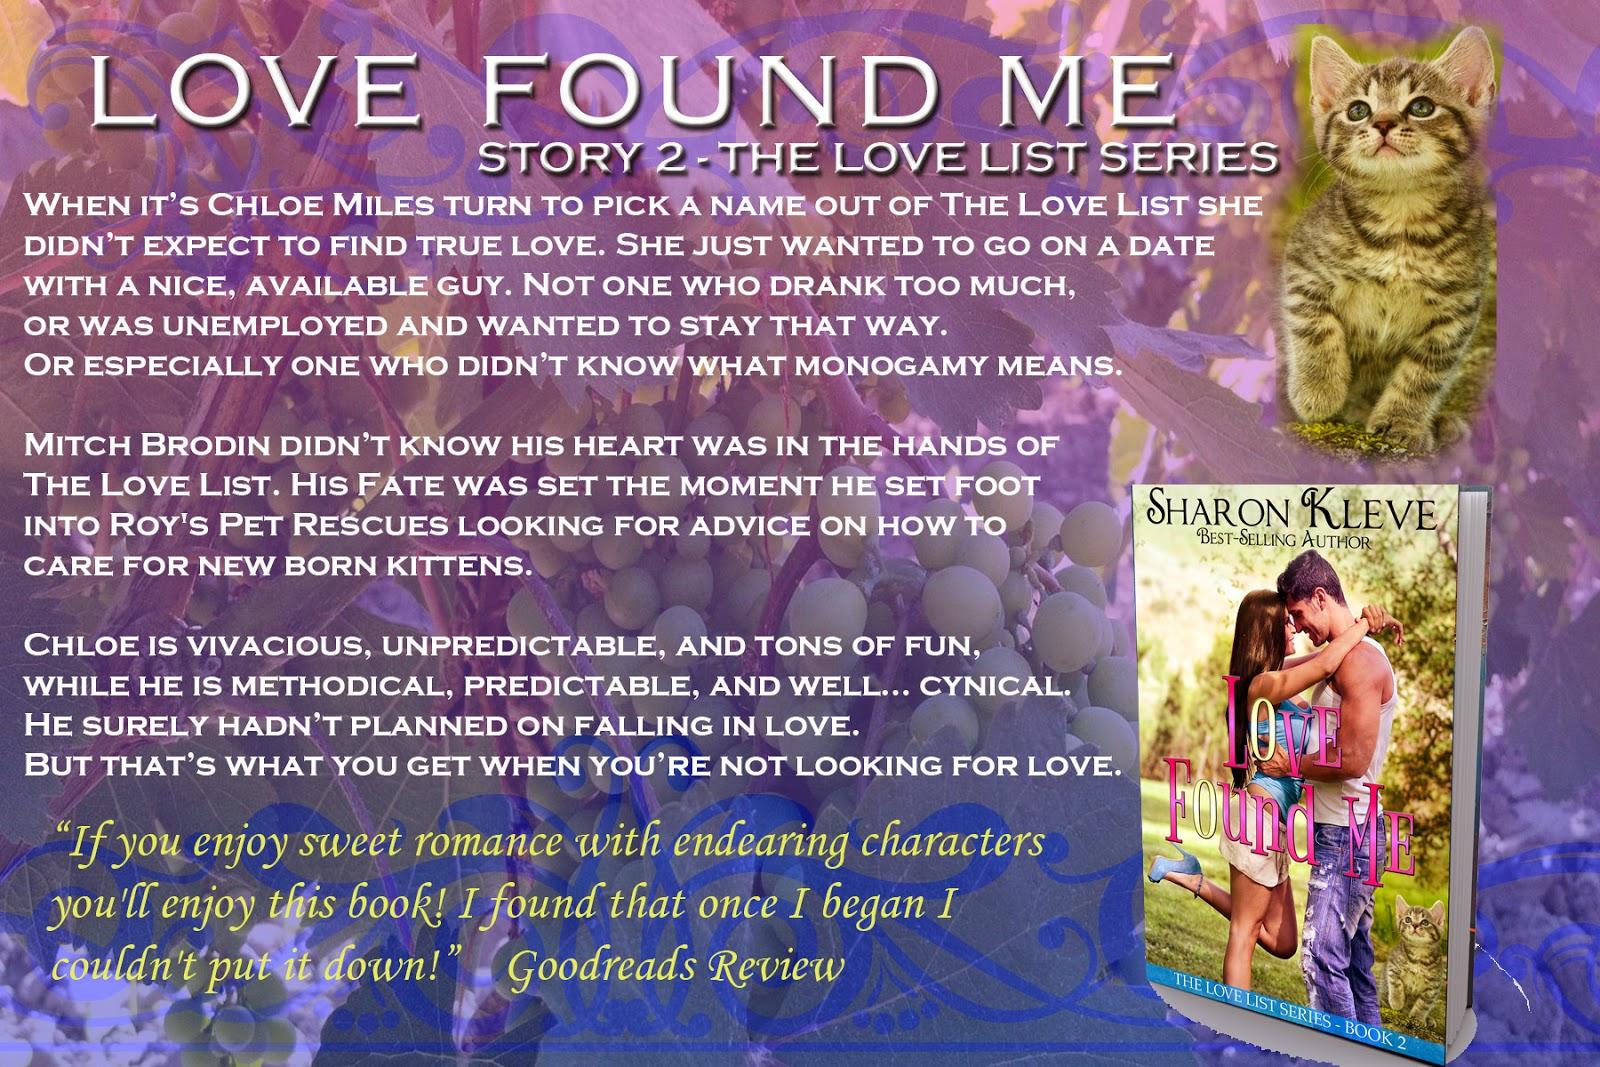 Sharon kleves romantic ramblings love found me amazon httpamazonlove found me list book ebook dpb00noazl0crefsr13ieutf8qid1411842442sr8 3keywordssharonkleve fandeluxe Images